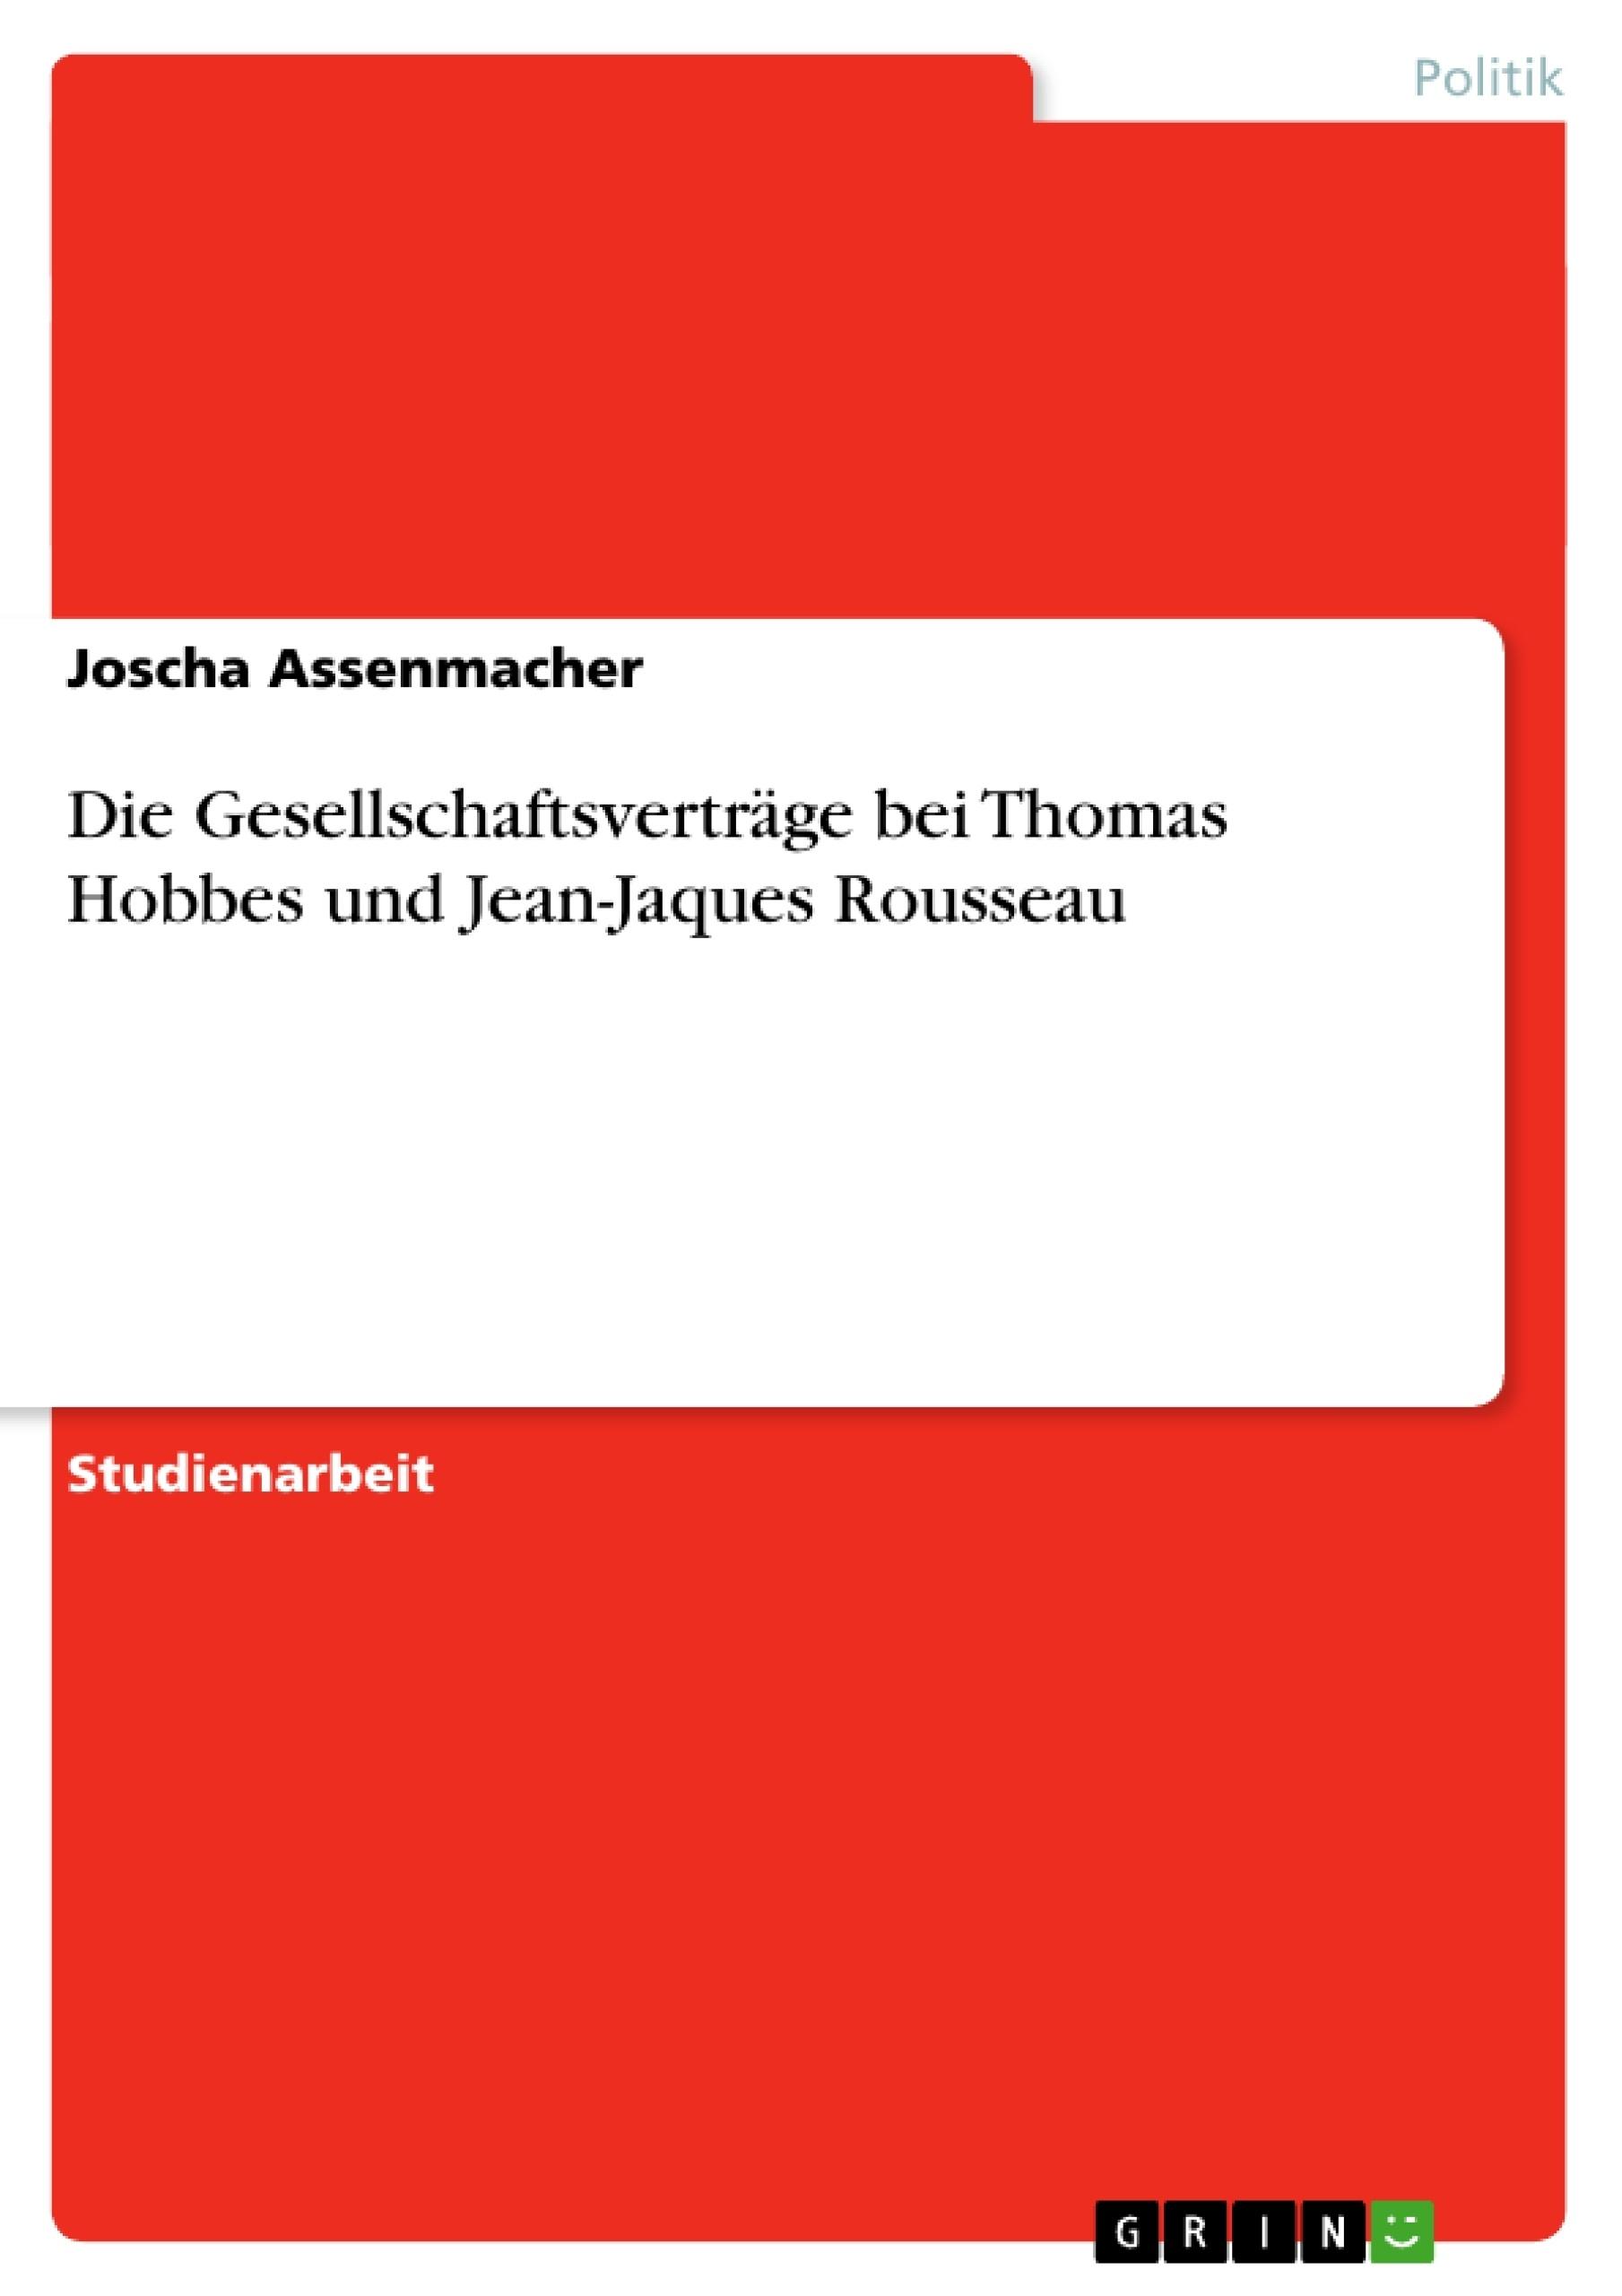 Titel: Die Gesellschaftsverträge bei Thomas Hobbes und Jean-Jaques Rousseau